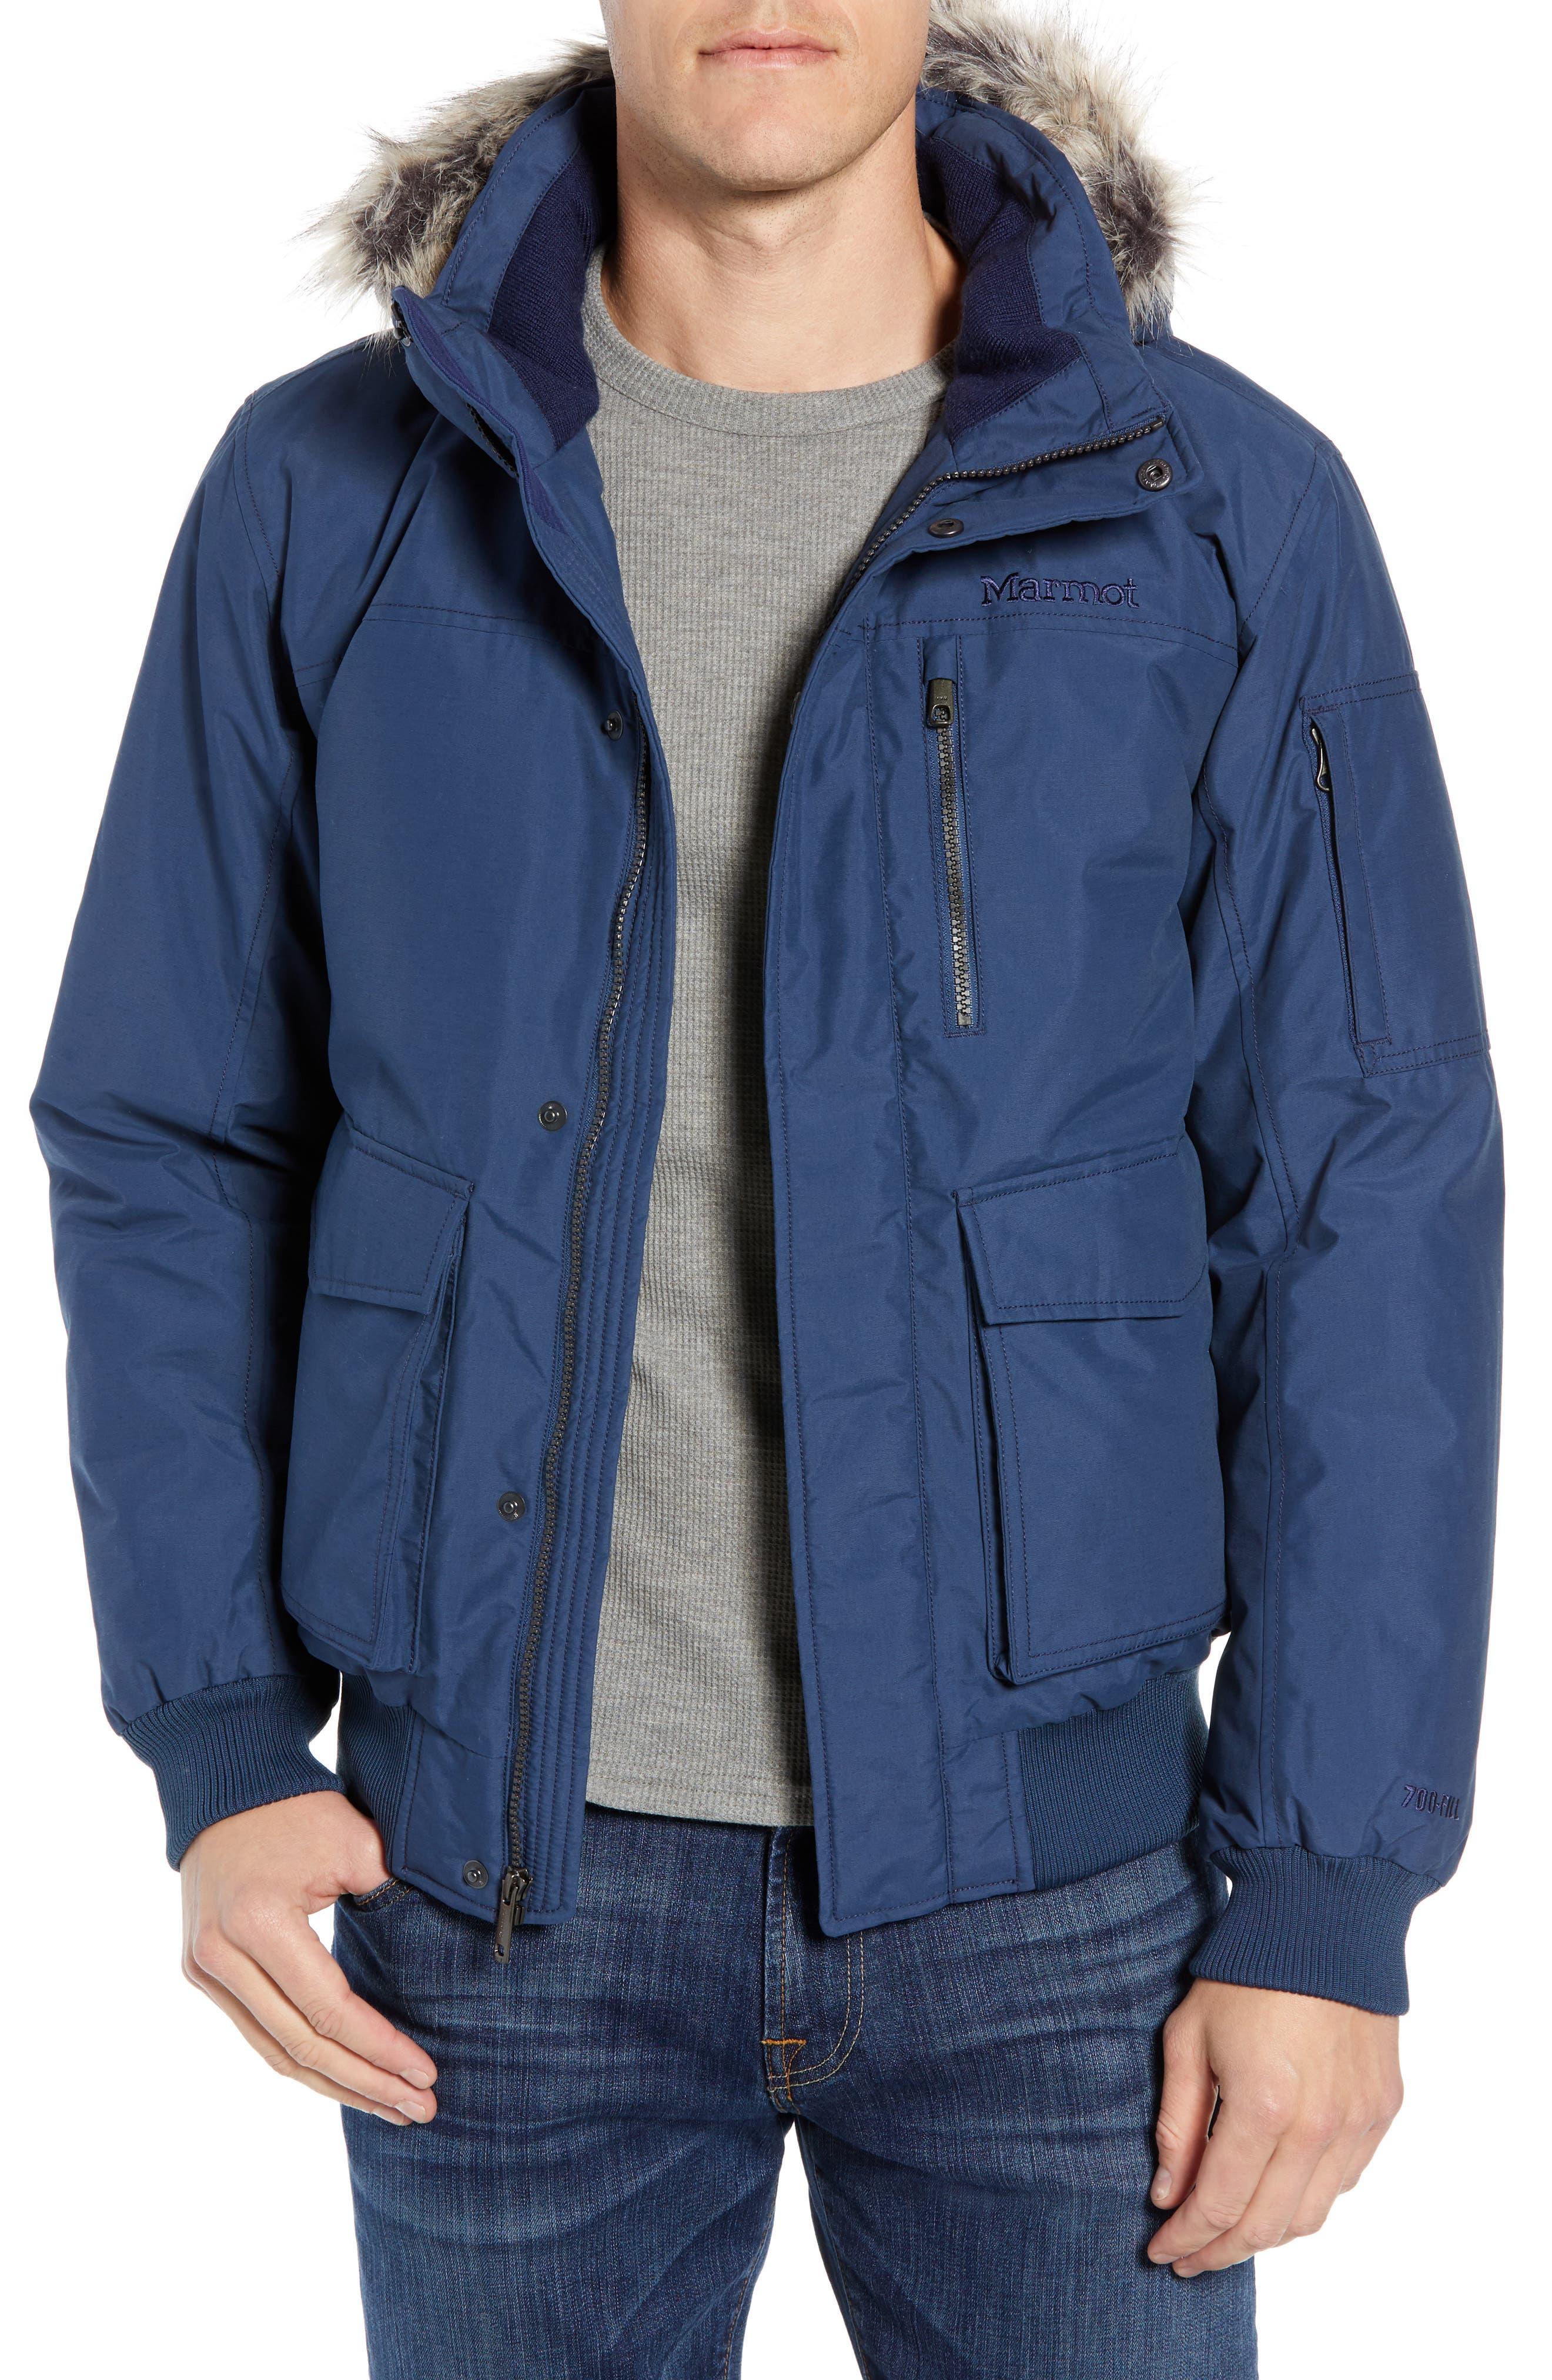 Marmot Stonehaven Waterproof 700 Fill Power Down Jacket With Faux Fur Trim, Blue